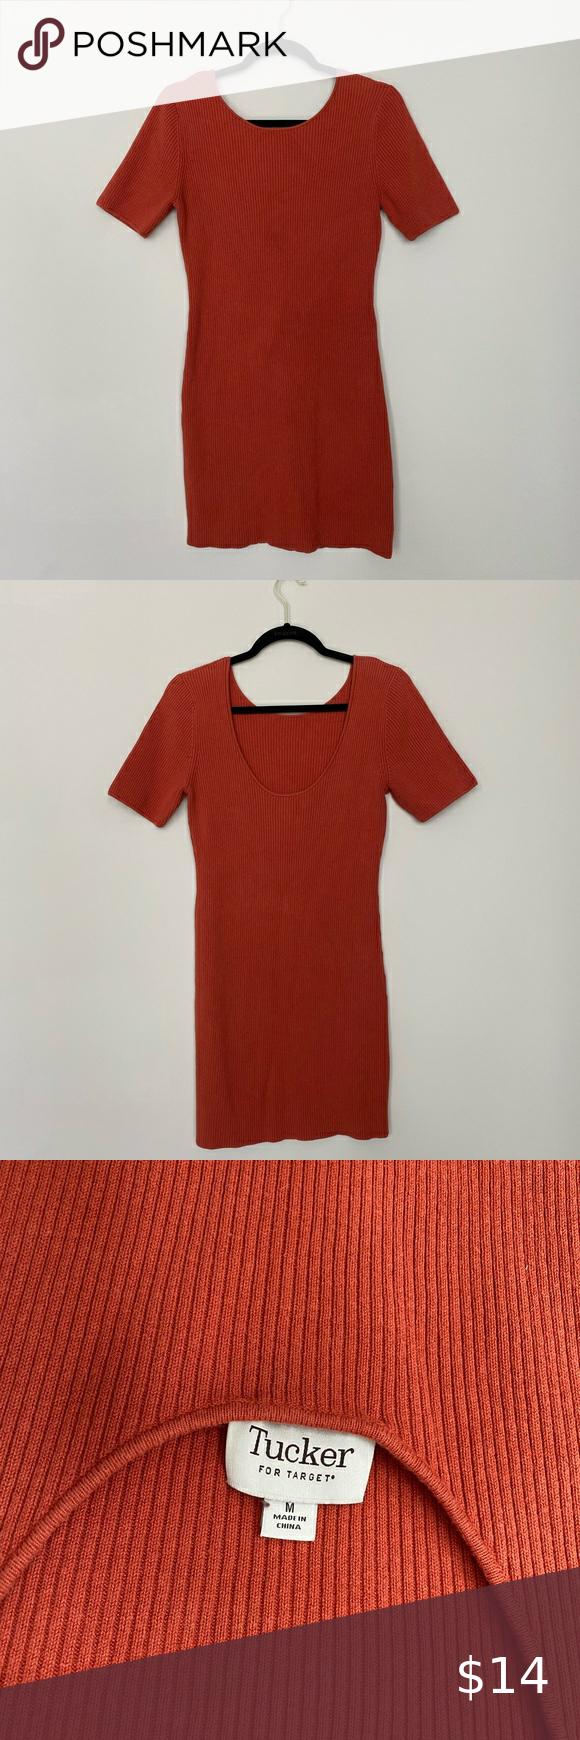 Tucker Target Ribbed Knit Dress Ribbed Knit Dress Knit Dress Ribbed Knit [ 1740 x 580 Pixel ]